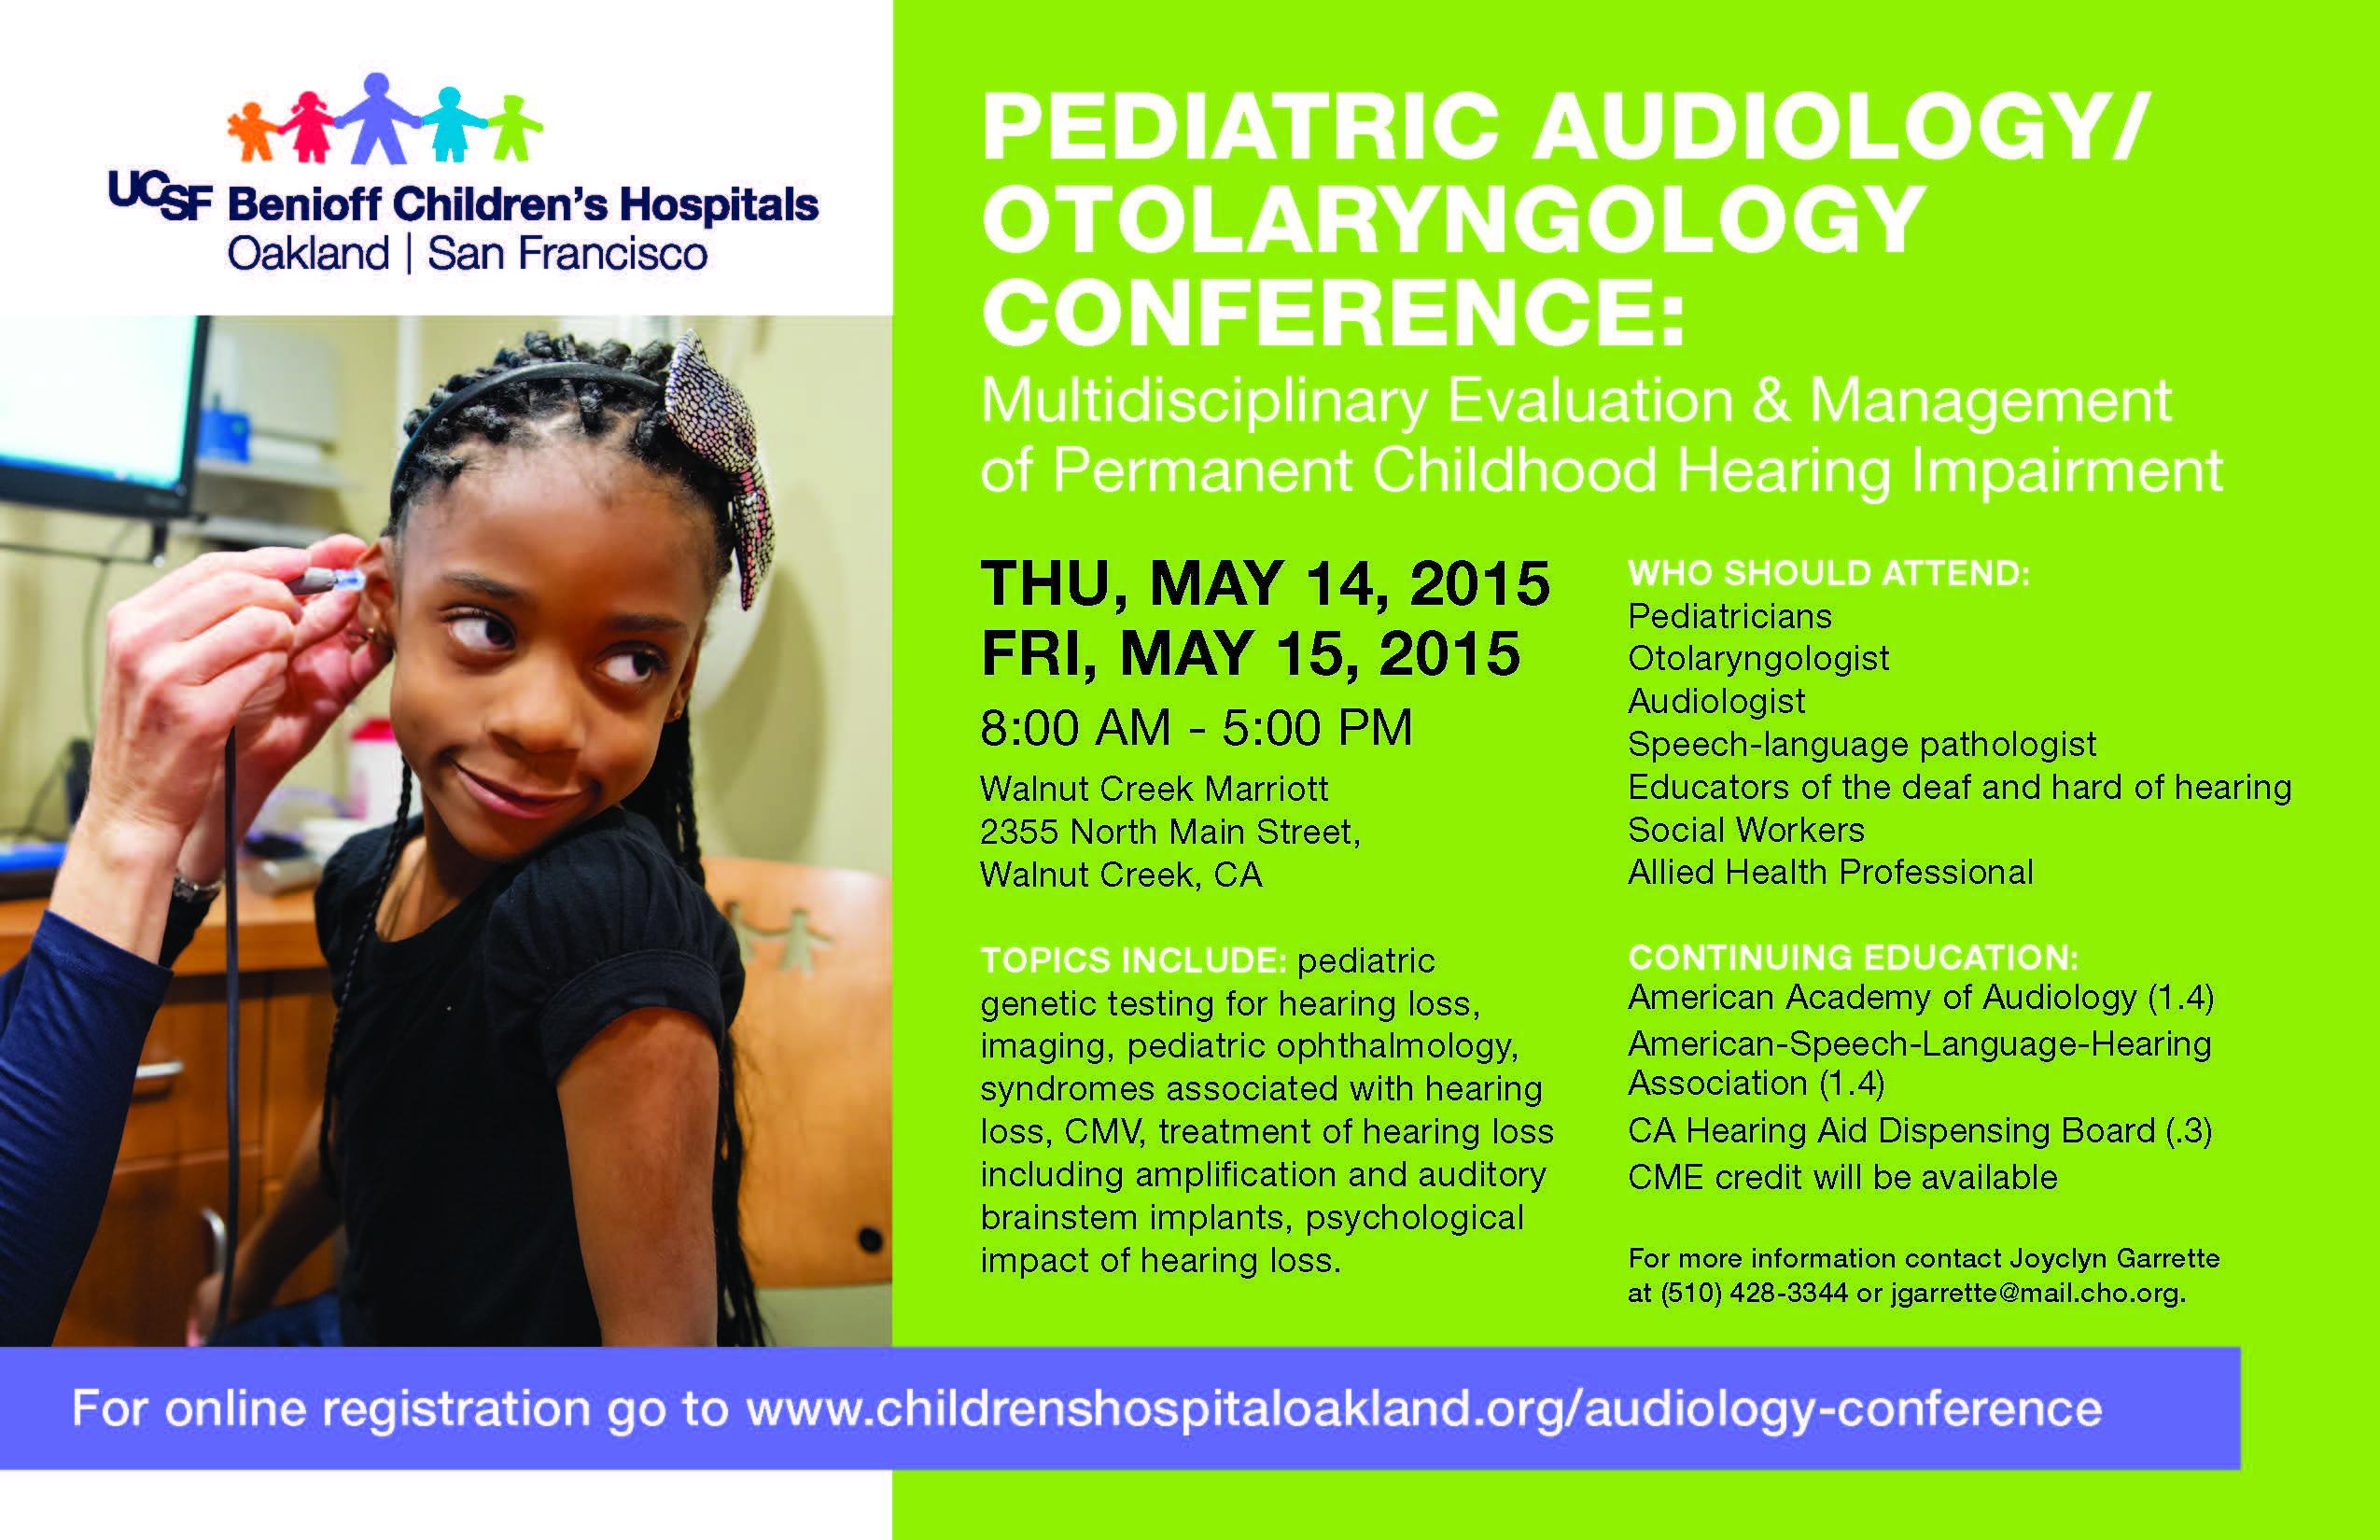 Ucsf Benioff Childrens Hospitals Pediatric Audiologyotolaryngology